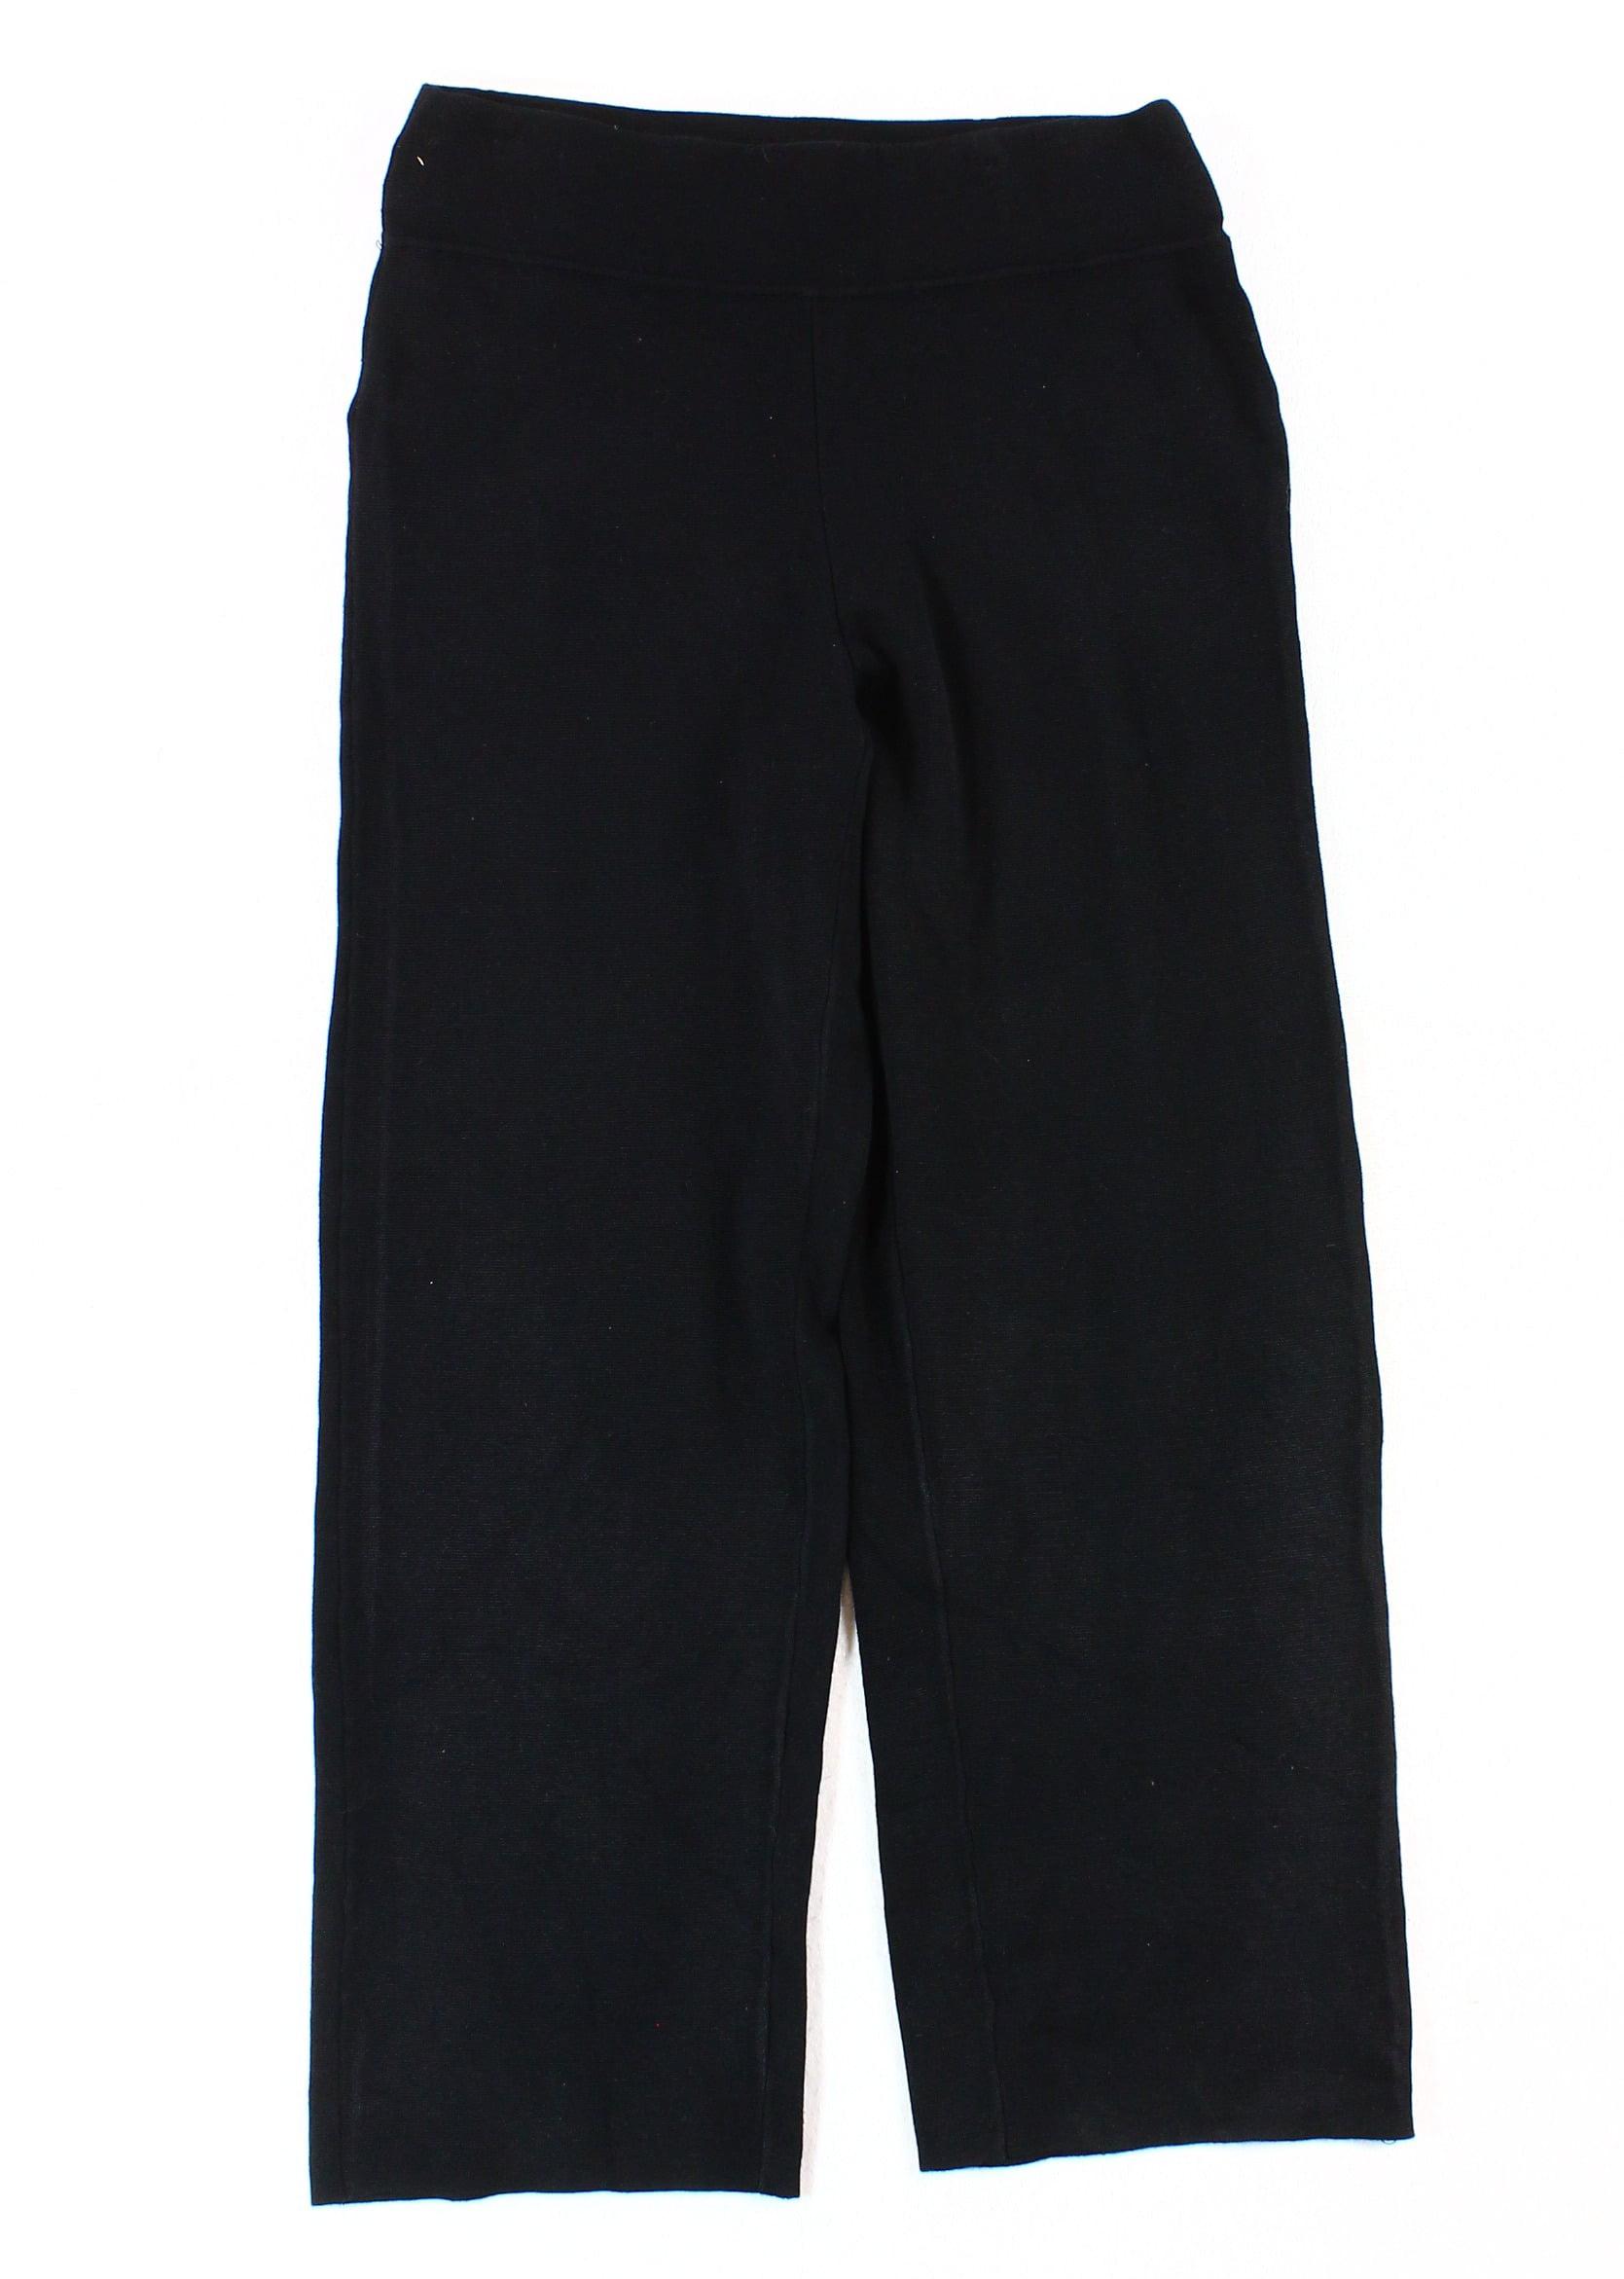 Alfani NEW Black Women's XL Pull-On Wide-Leg Knit Trousers Pants